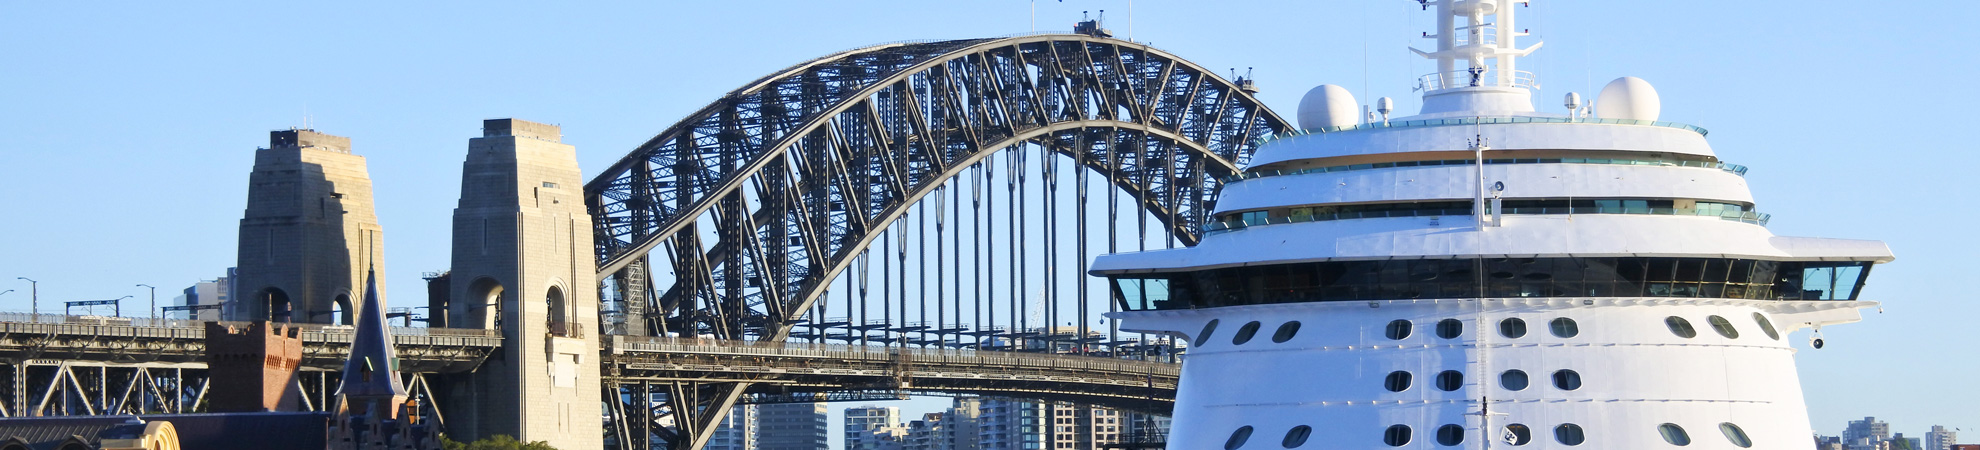 Aller en Australie en bateau